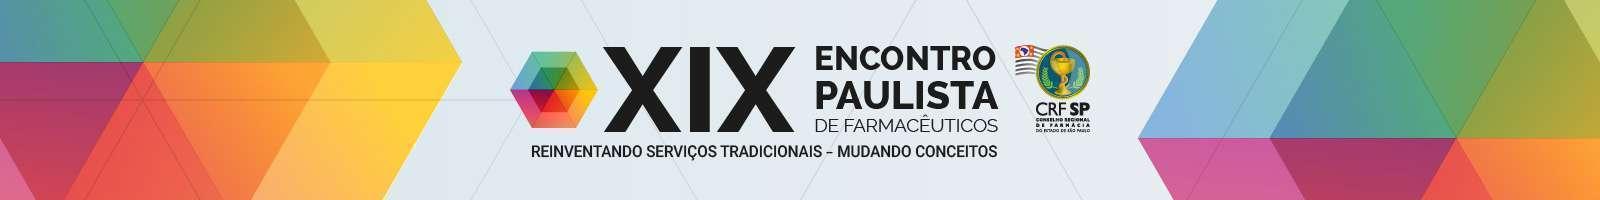 XIX Encontro Paulista